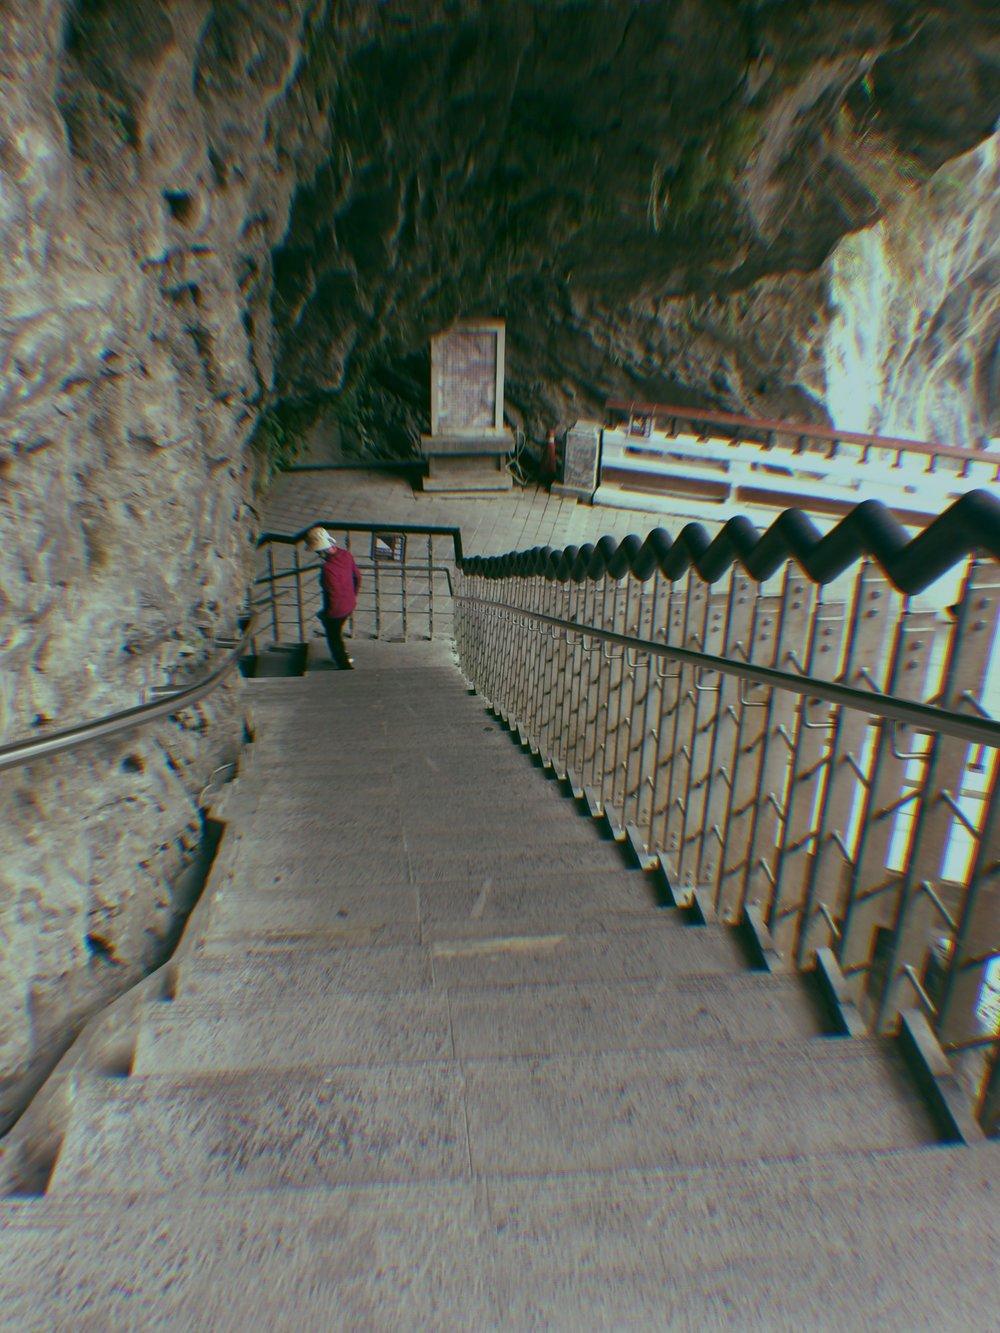 Exploring Taroko Gorge on Taiwan's east coast